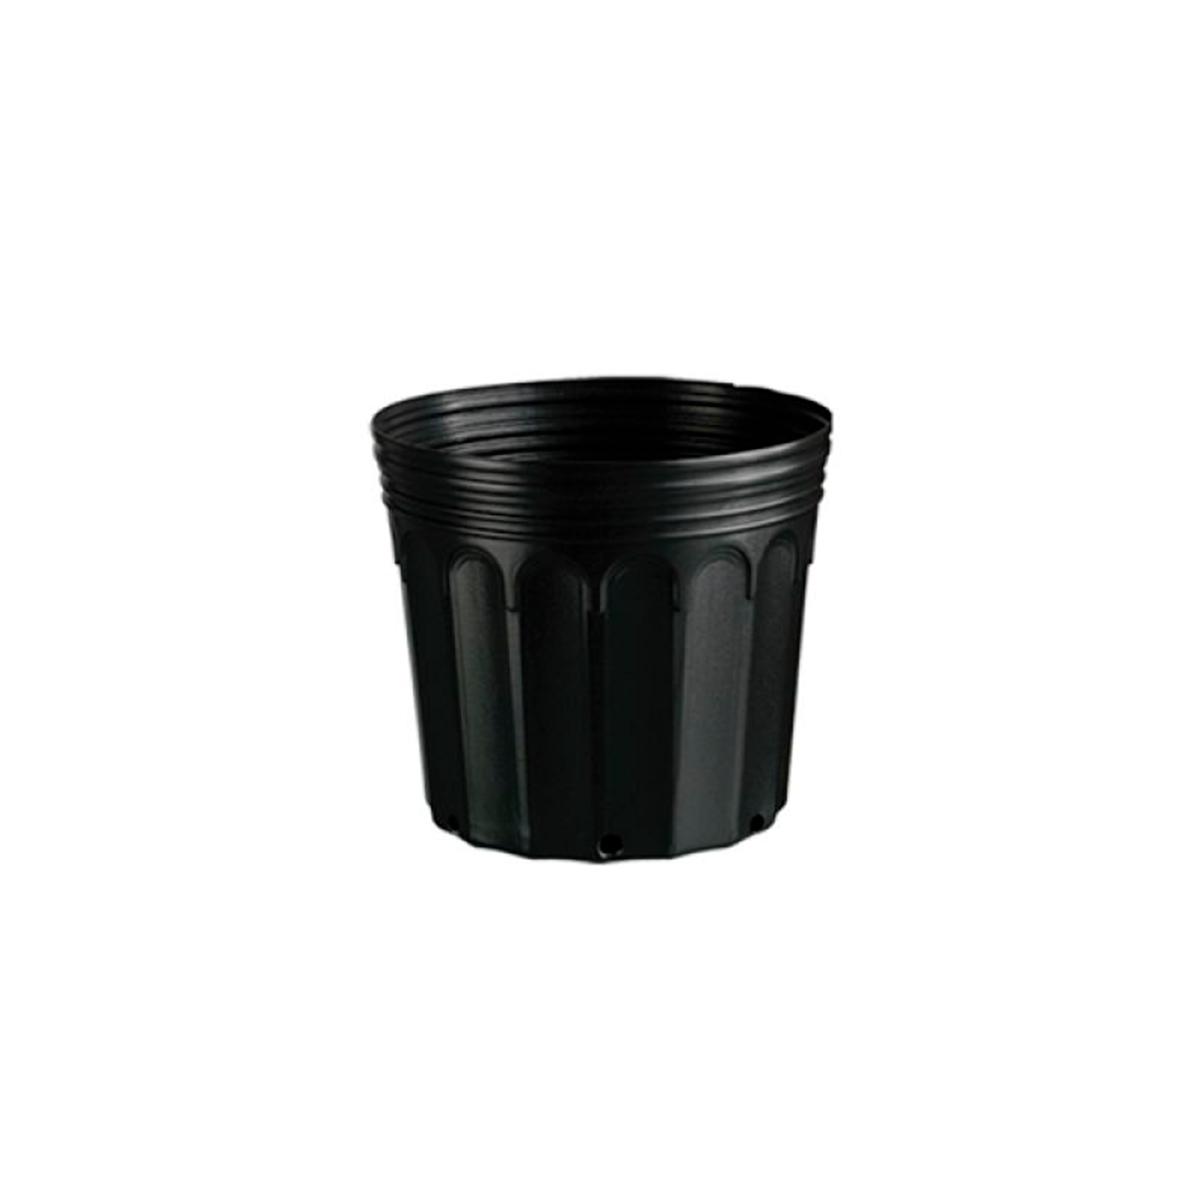 Kit 35 Embalagem para Mudas Flexível Plástico 8,5L